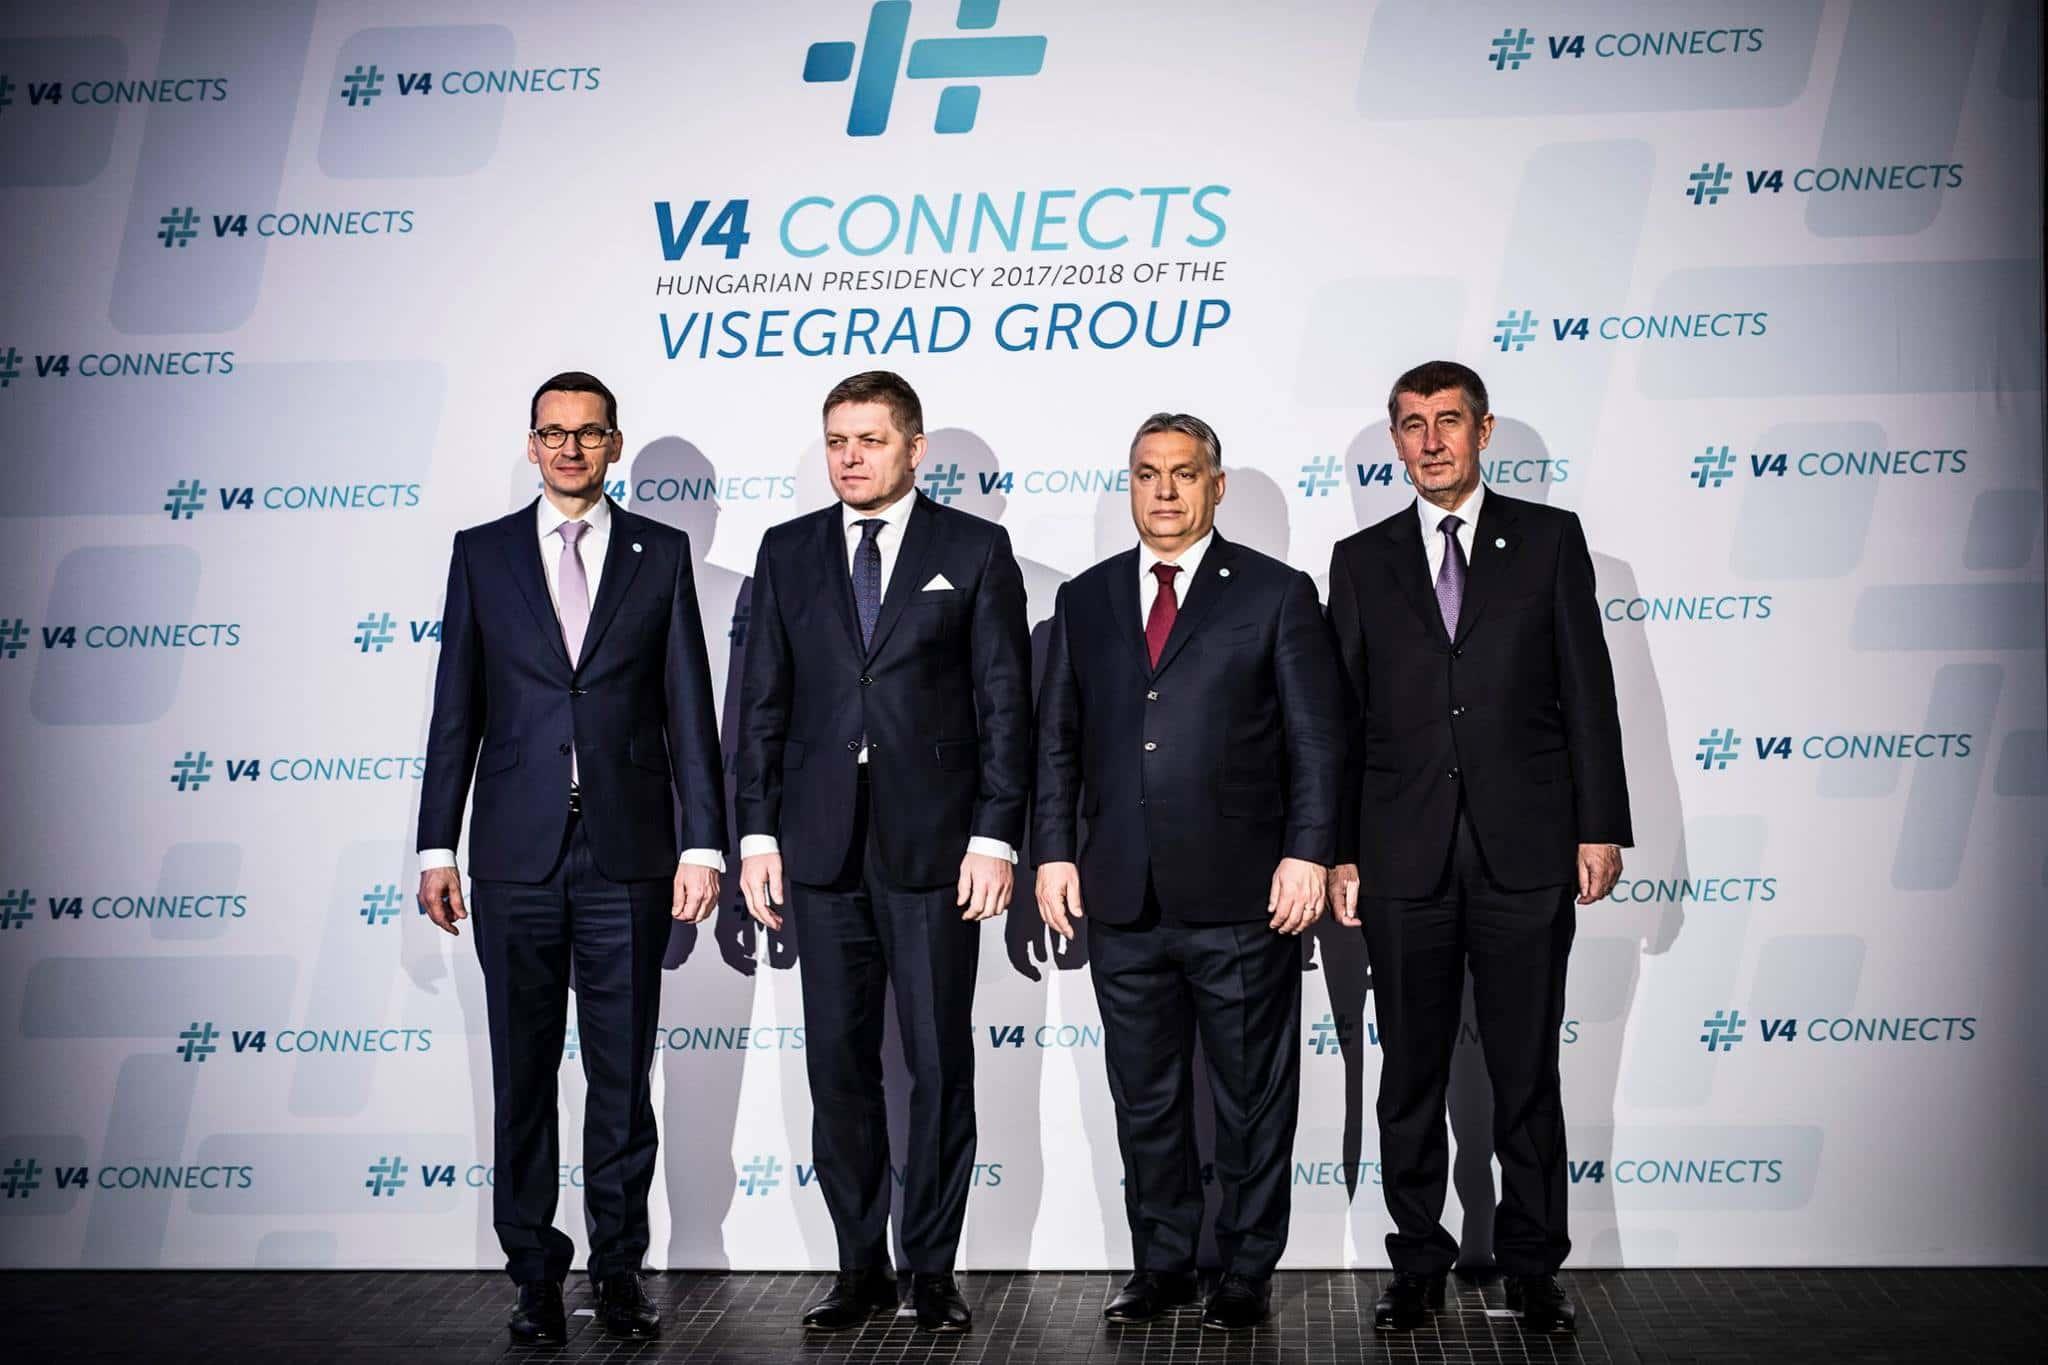 De gauche à droite : Mateusz Morawiecki (PL), Robert Fico (SK), Viktor Orbán (HU), Andrej Babiš (CZ). Photo : page facebook de Viktor Orbán.